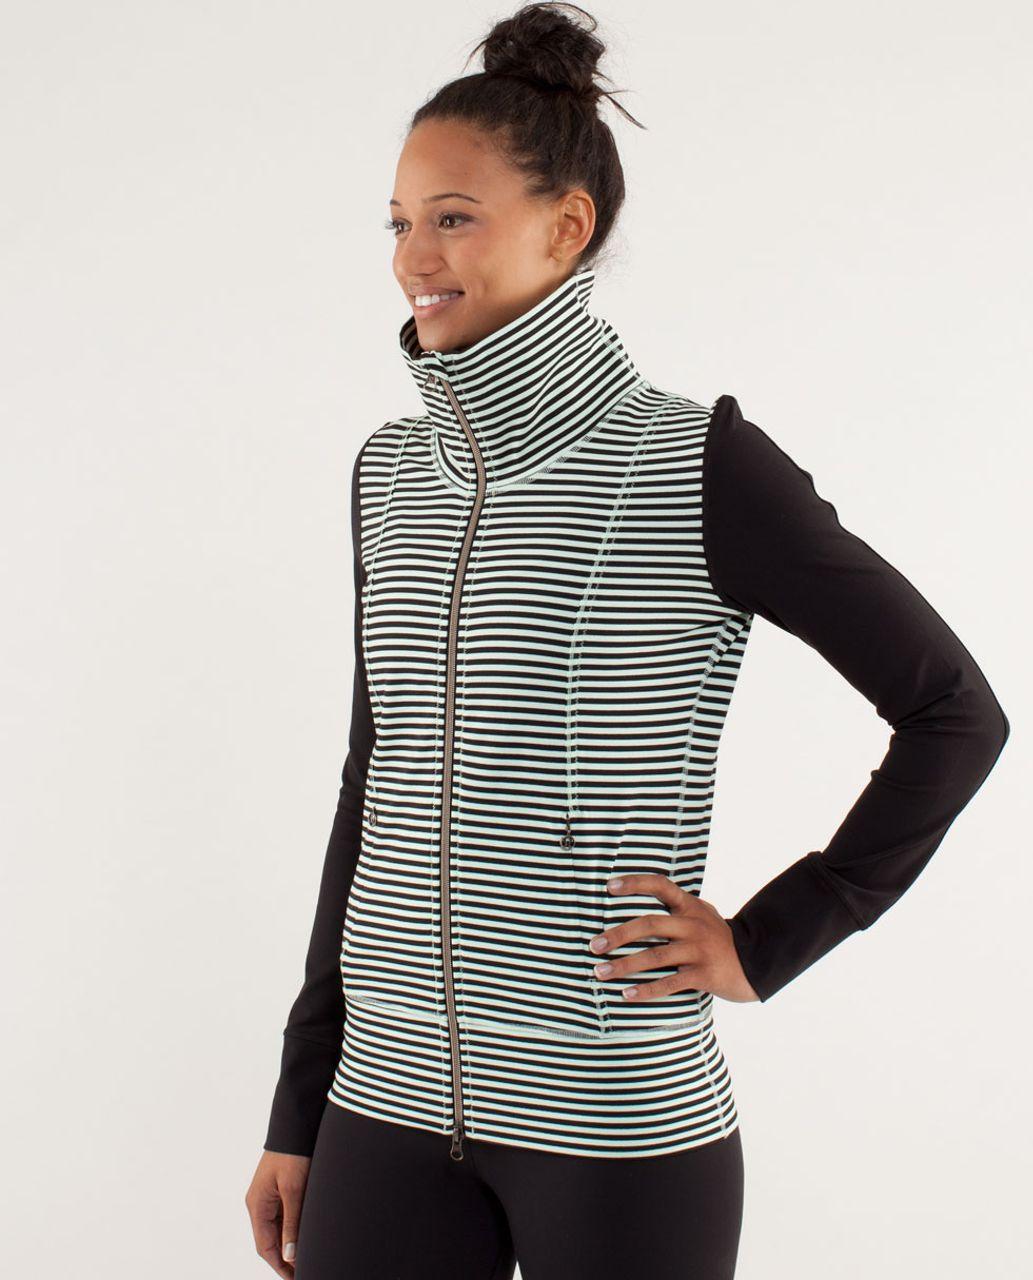 ecde76dc0b Lululemon Daily Yoga Jacket - Classic Stripe Mint Moment Black ...